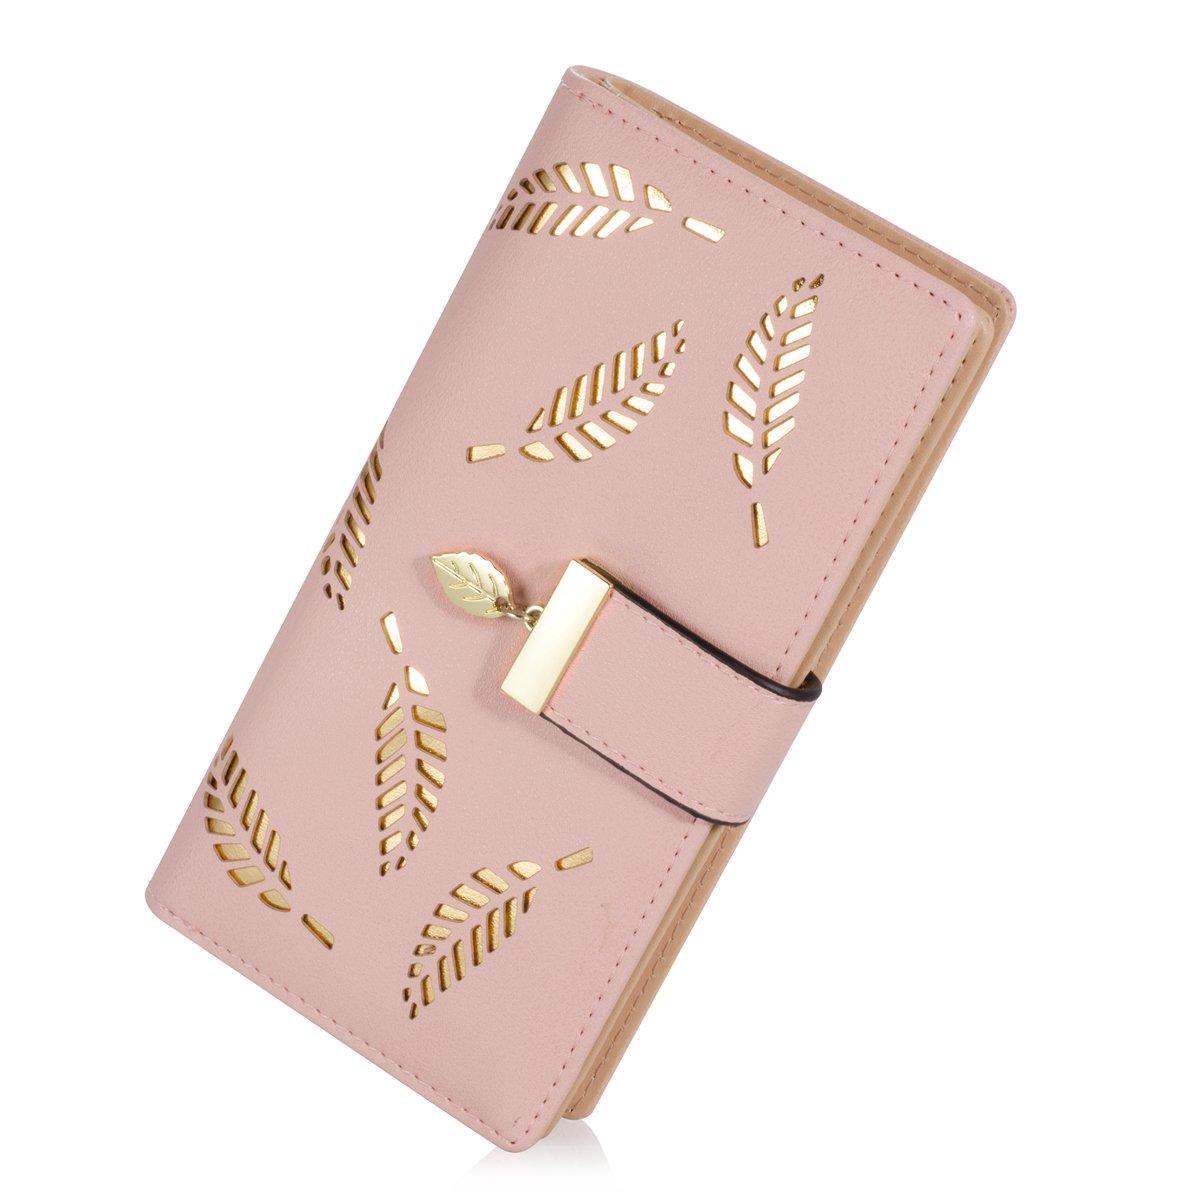 PGXT Women's Long Leather Card Holder Purse Zipper Buckle Elegant Clutch Wallet (Pink) by PGXT